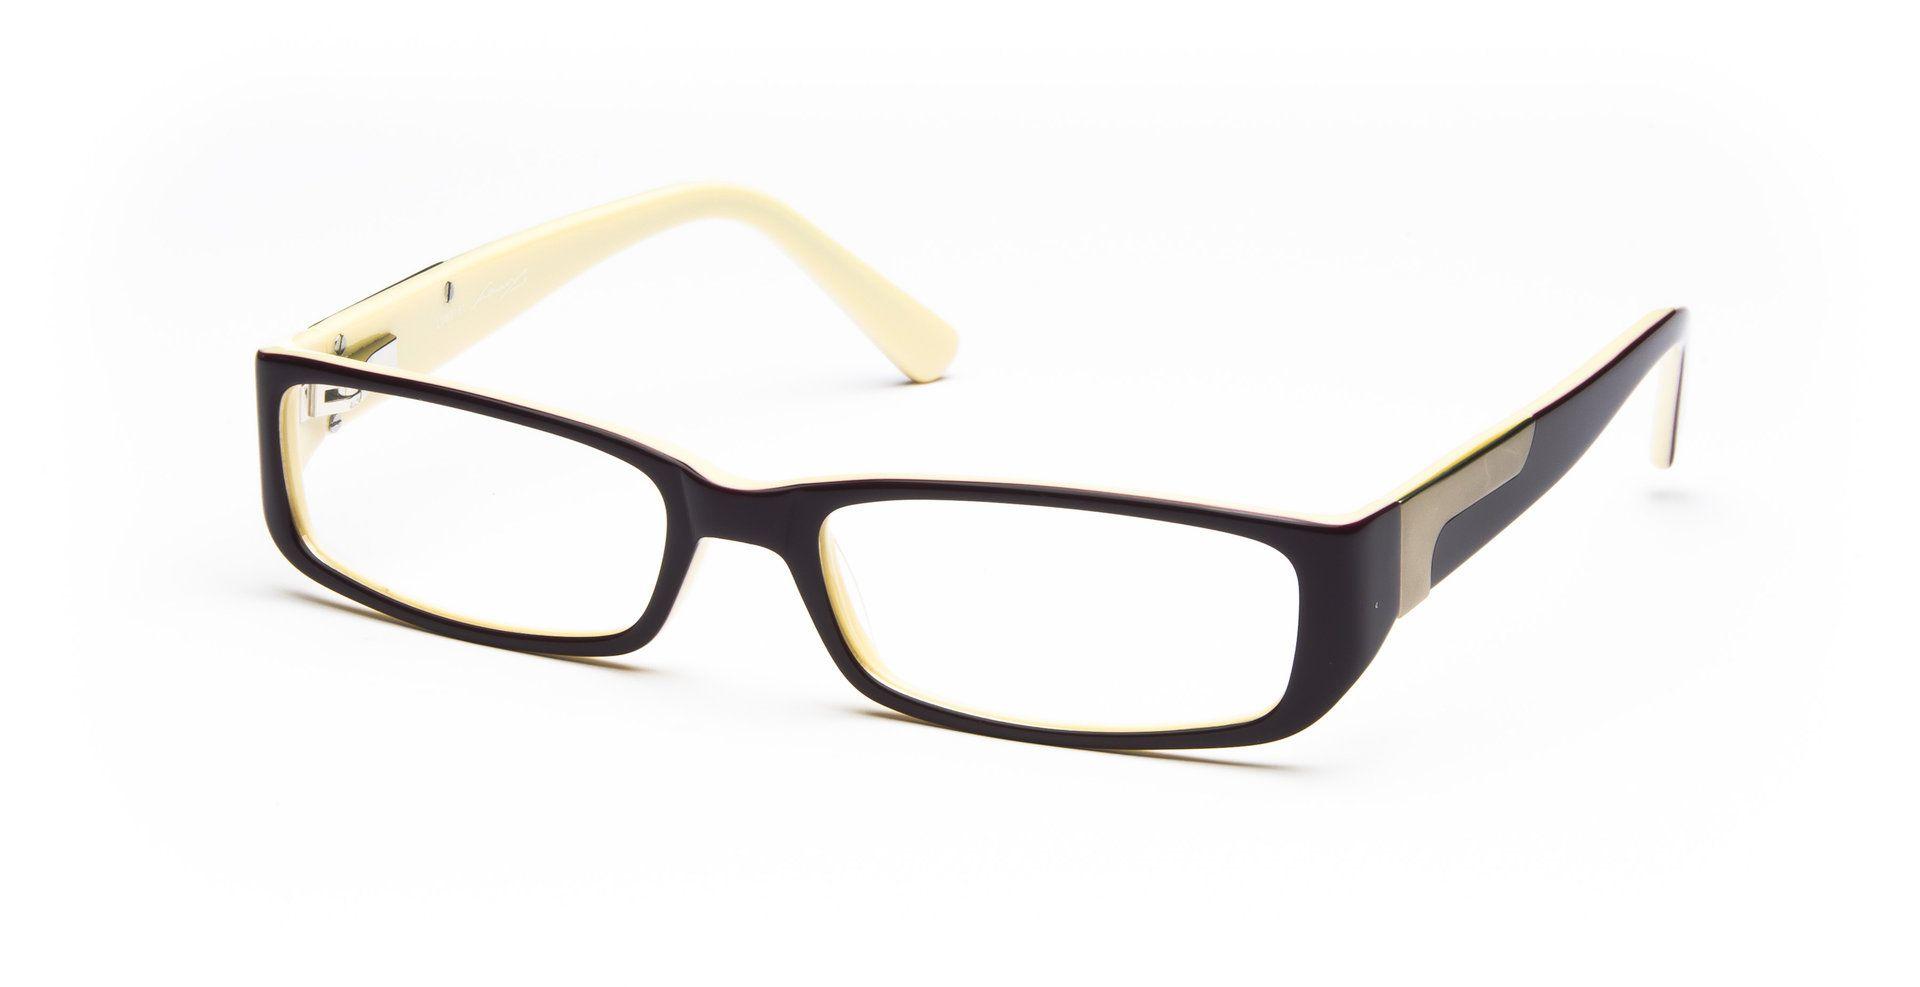 Lennox Eyewear Shajor Lila/Natur - Damenbrillen | Colortrends - Die